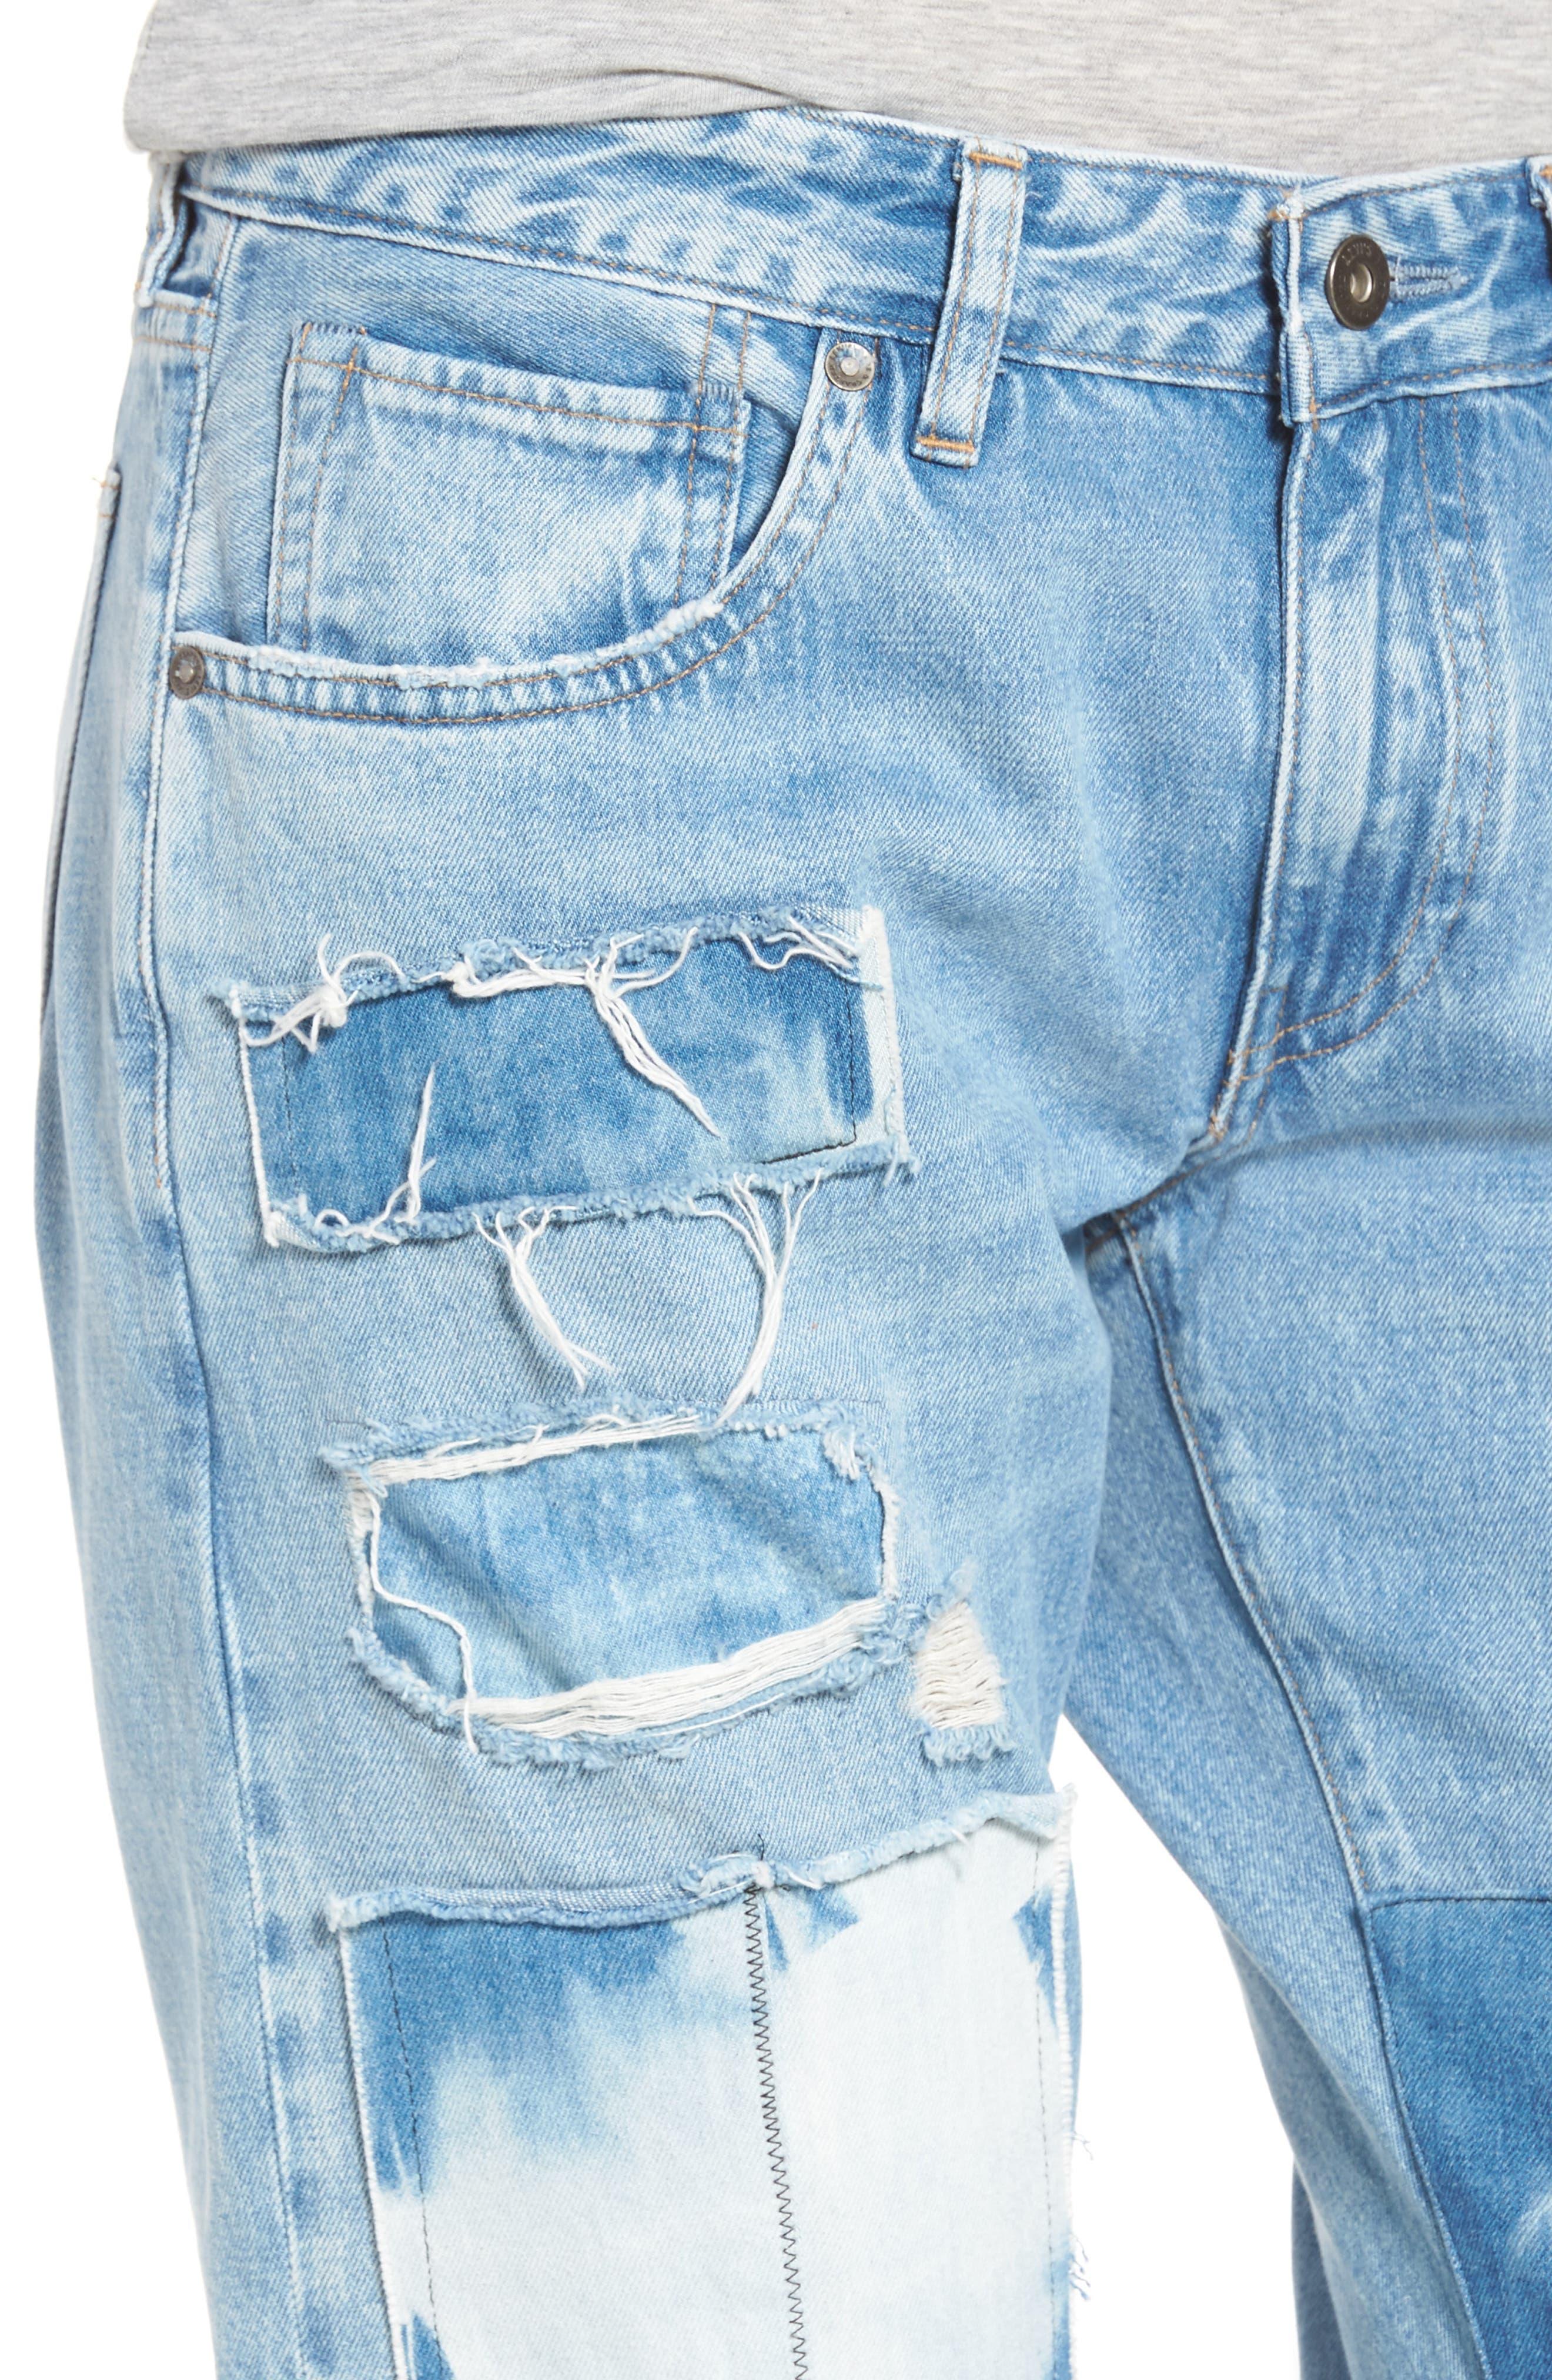 Crush Tapered Jeans,                             Alternate thumbnail 4, color,                             Tidal Wave